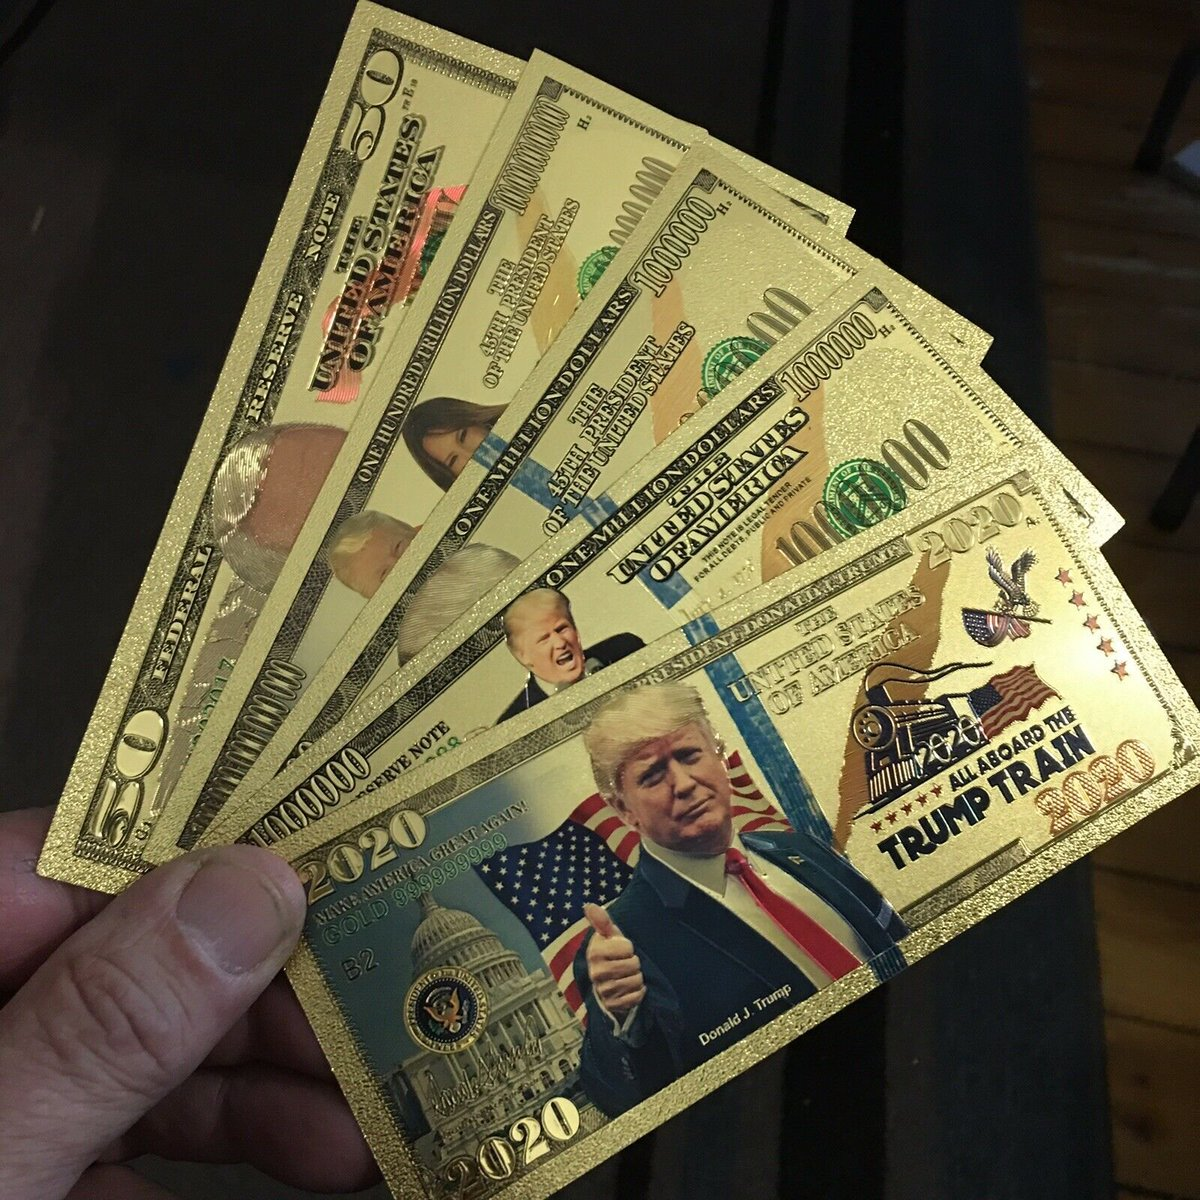 NEW! #Trump2020 #Collectibles! SHOP #ebayseller :   #Trump #Trump2020LandslideVictory #Trumps #TrumpSupporters